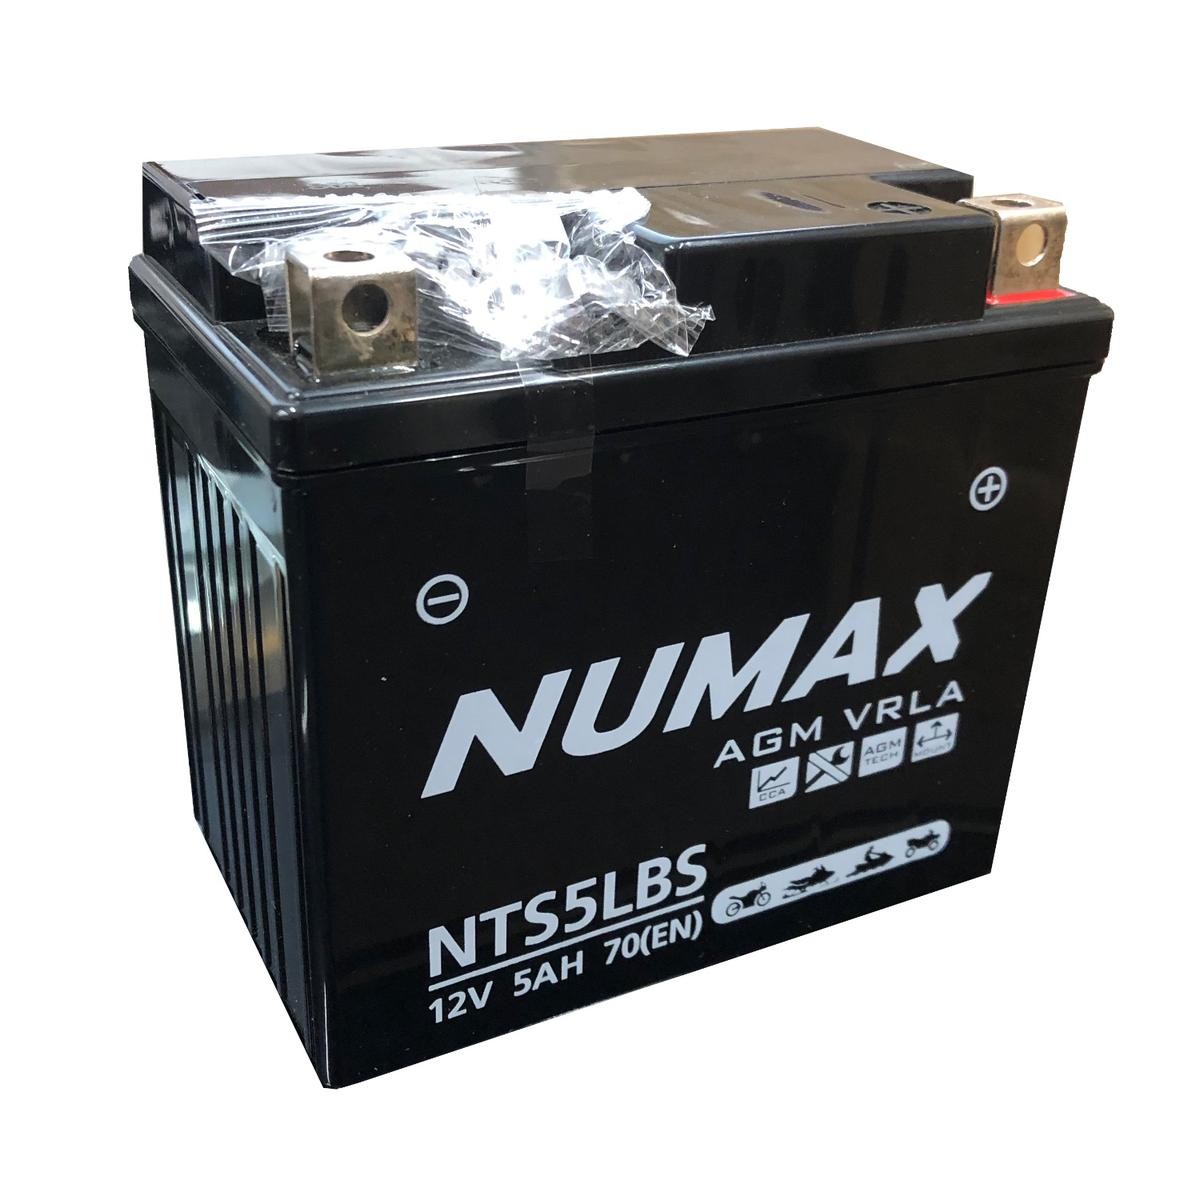 Numax 12v NTS5LBS Motorbike Bike Battery KYMCO 50cc People YT5L-4